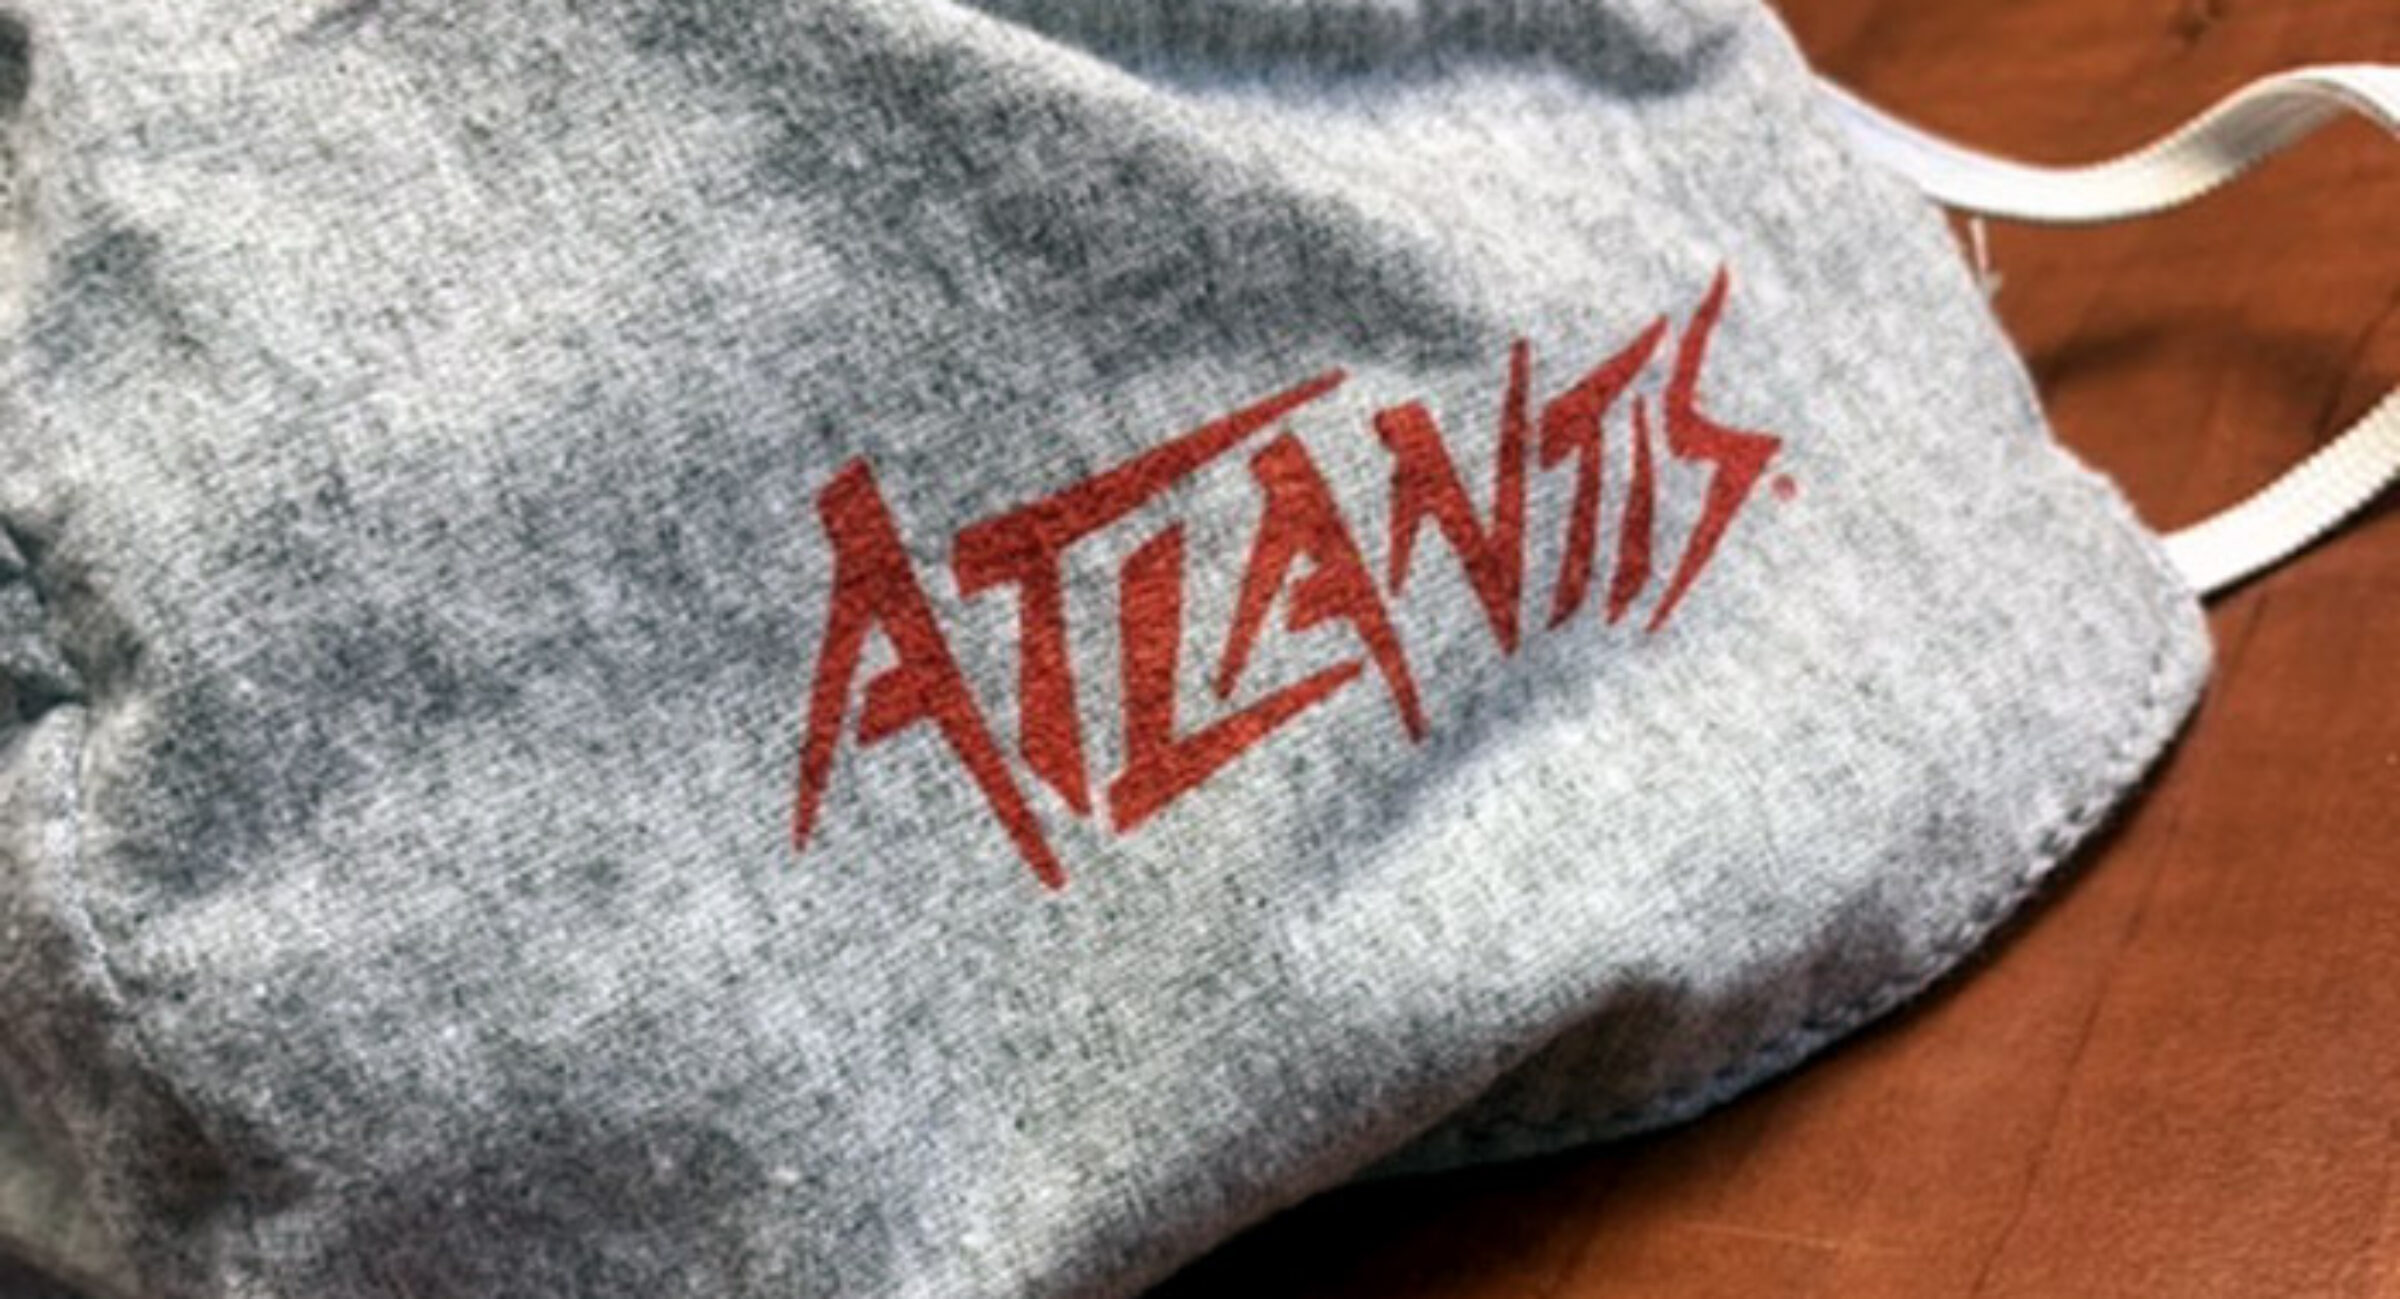 Atlantis Sportswear